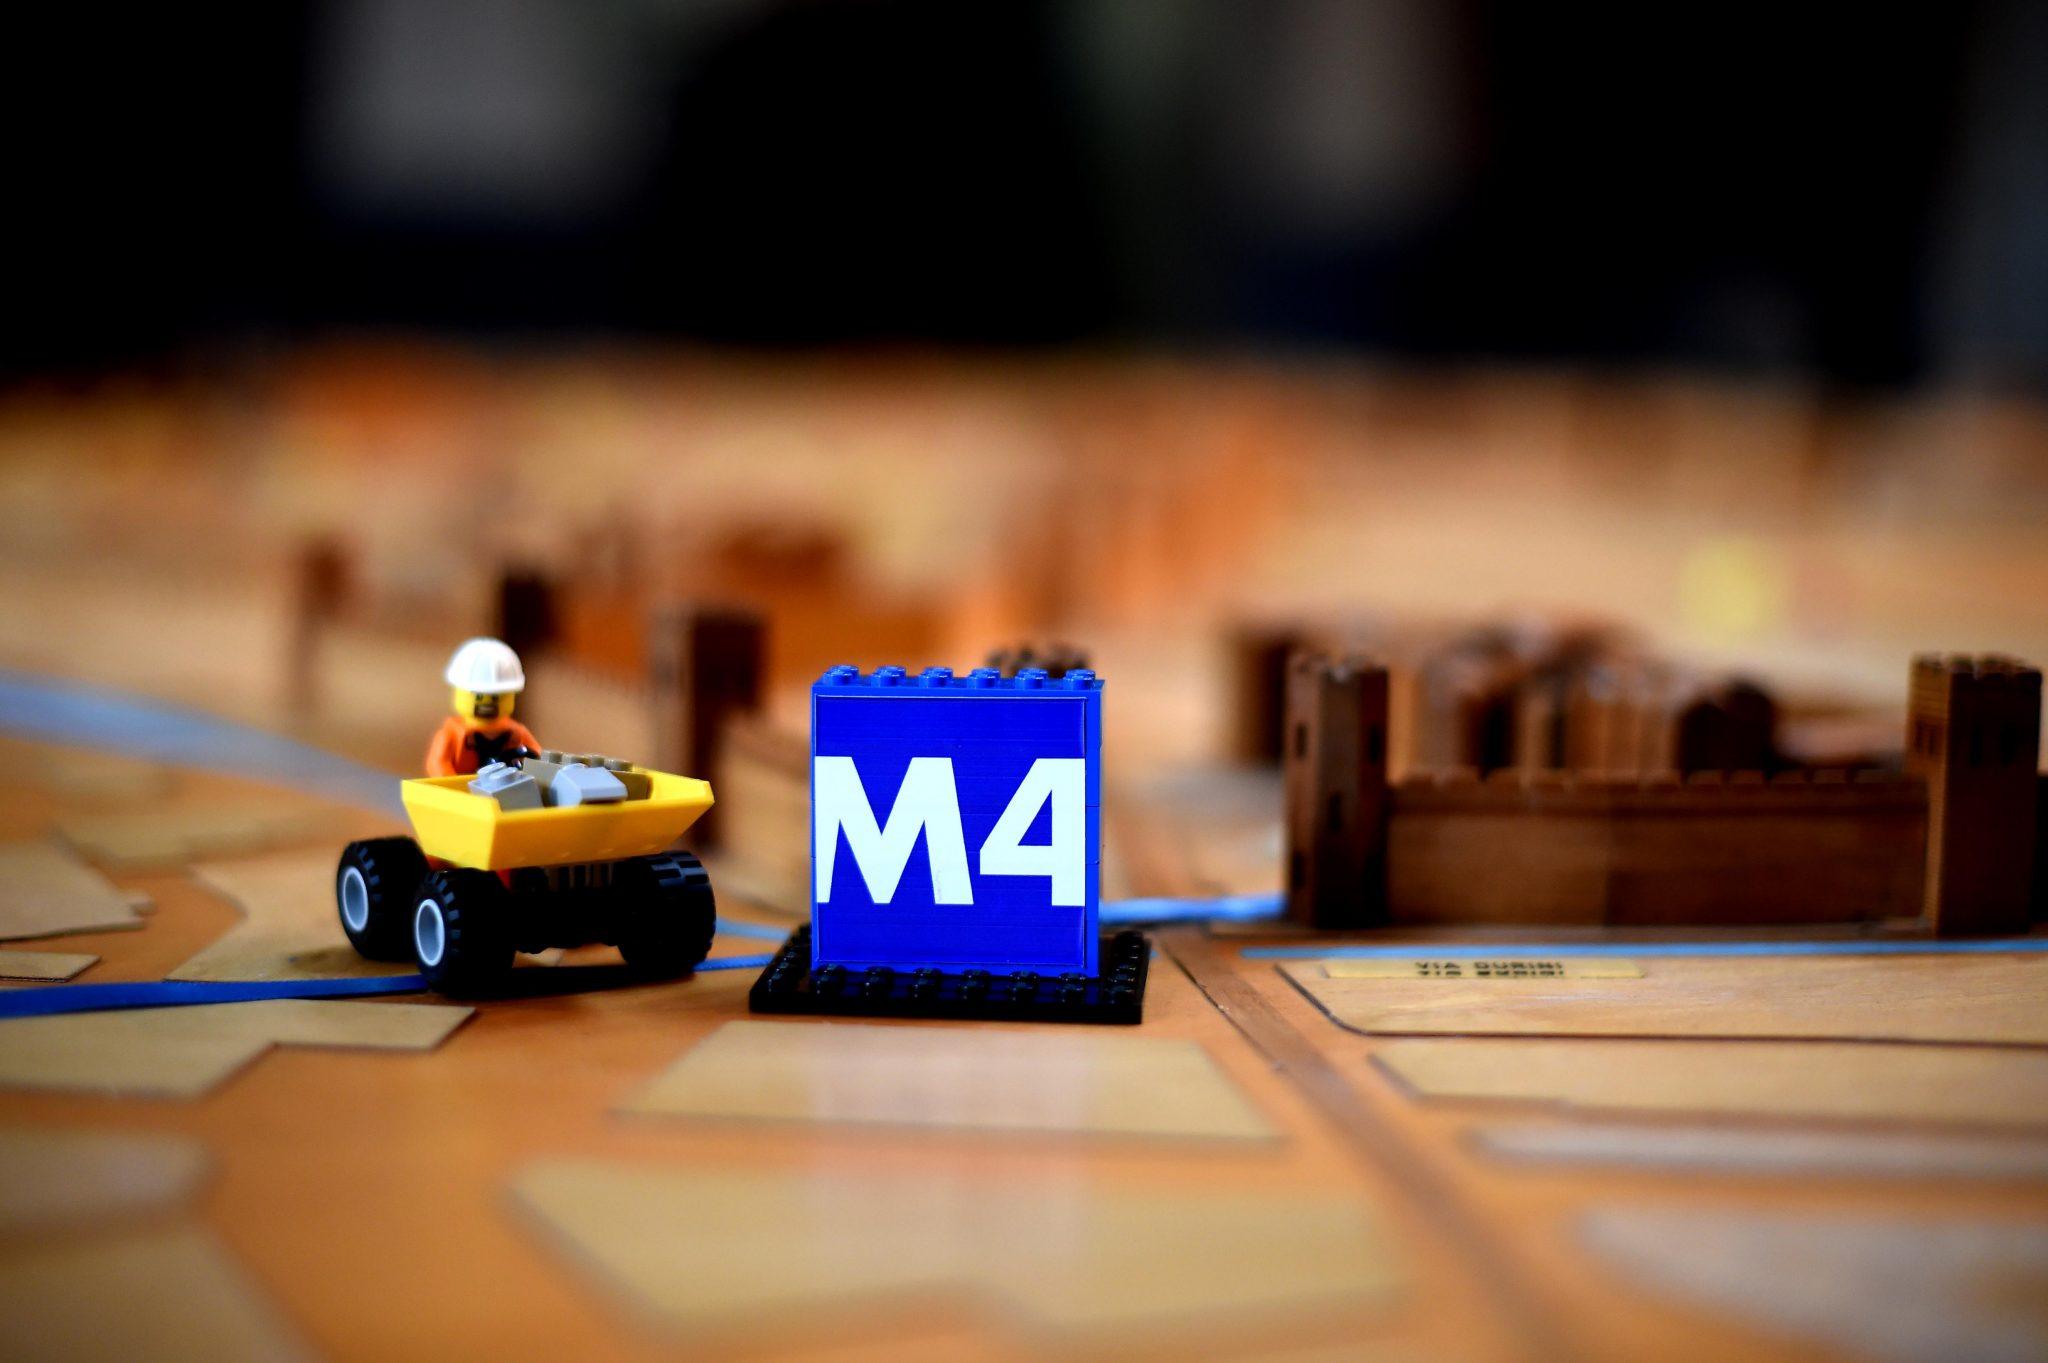 Dmf 3546